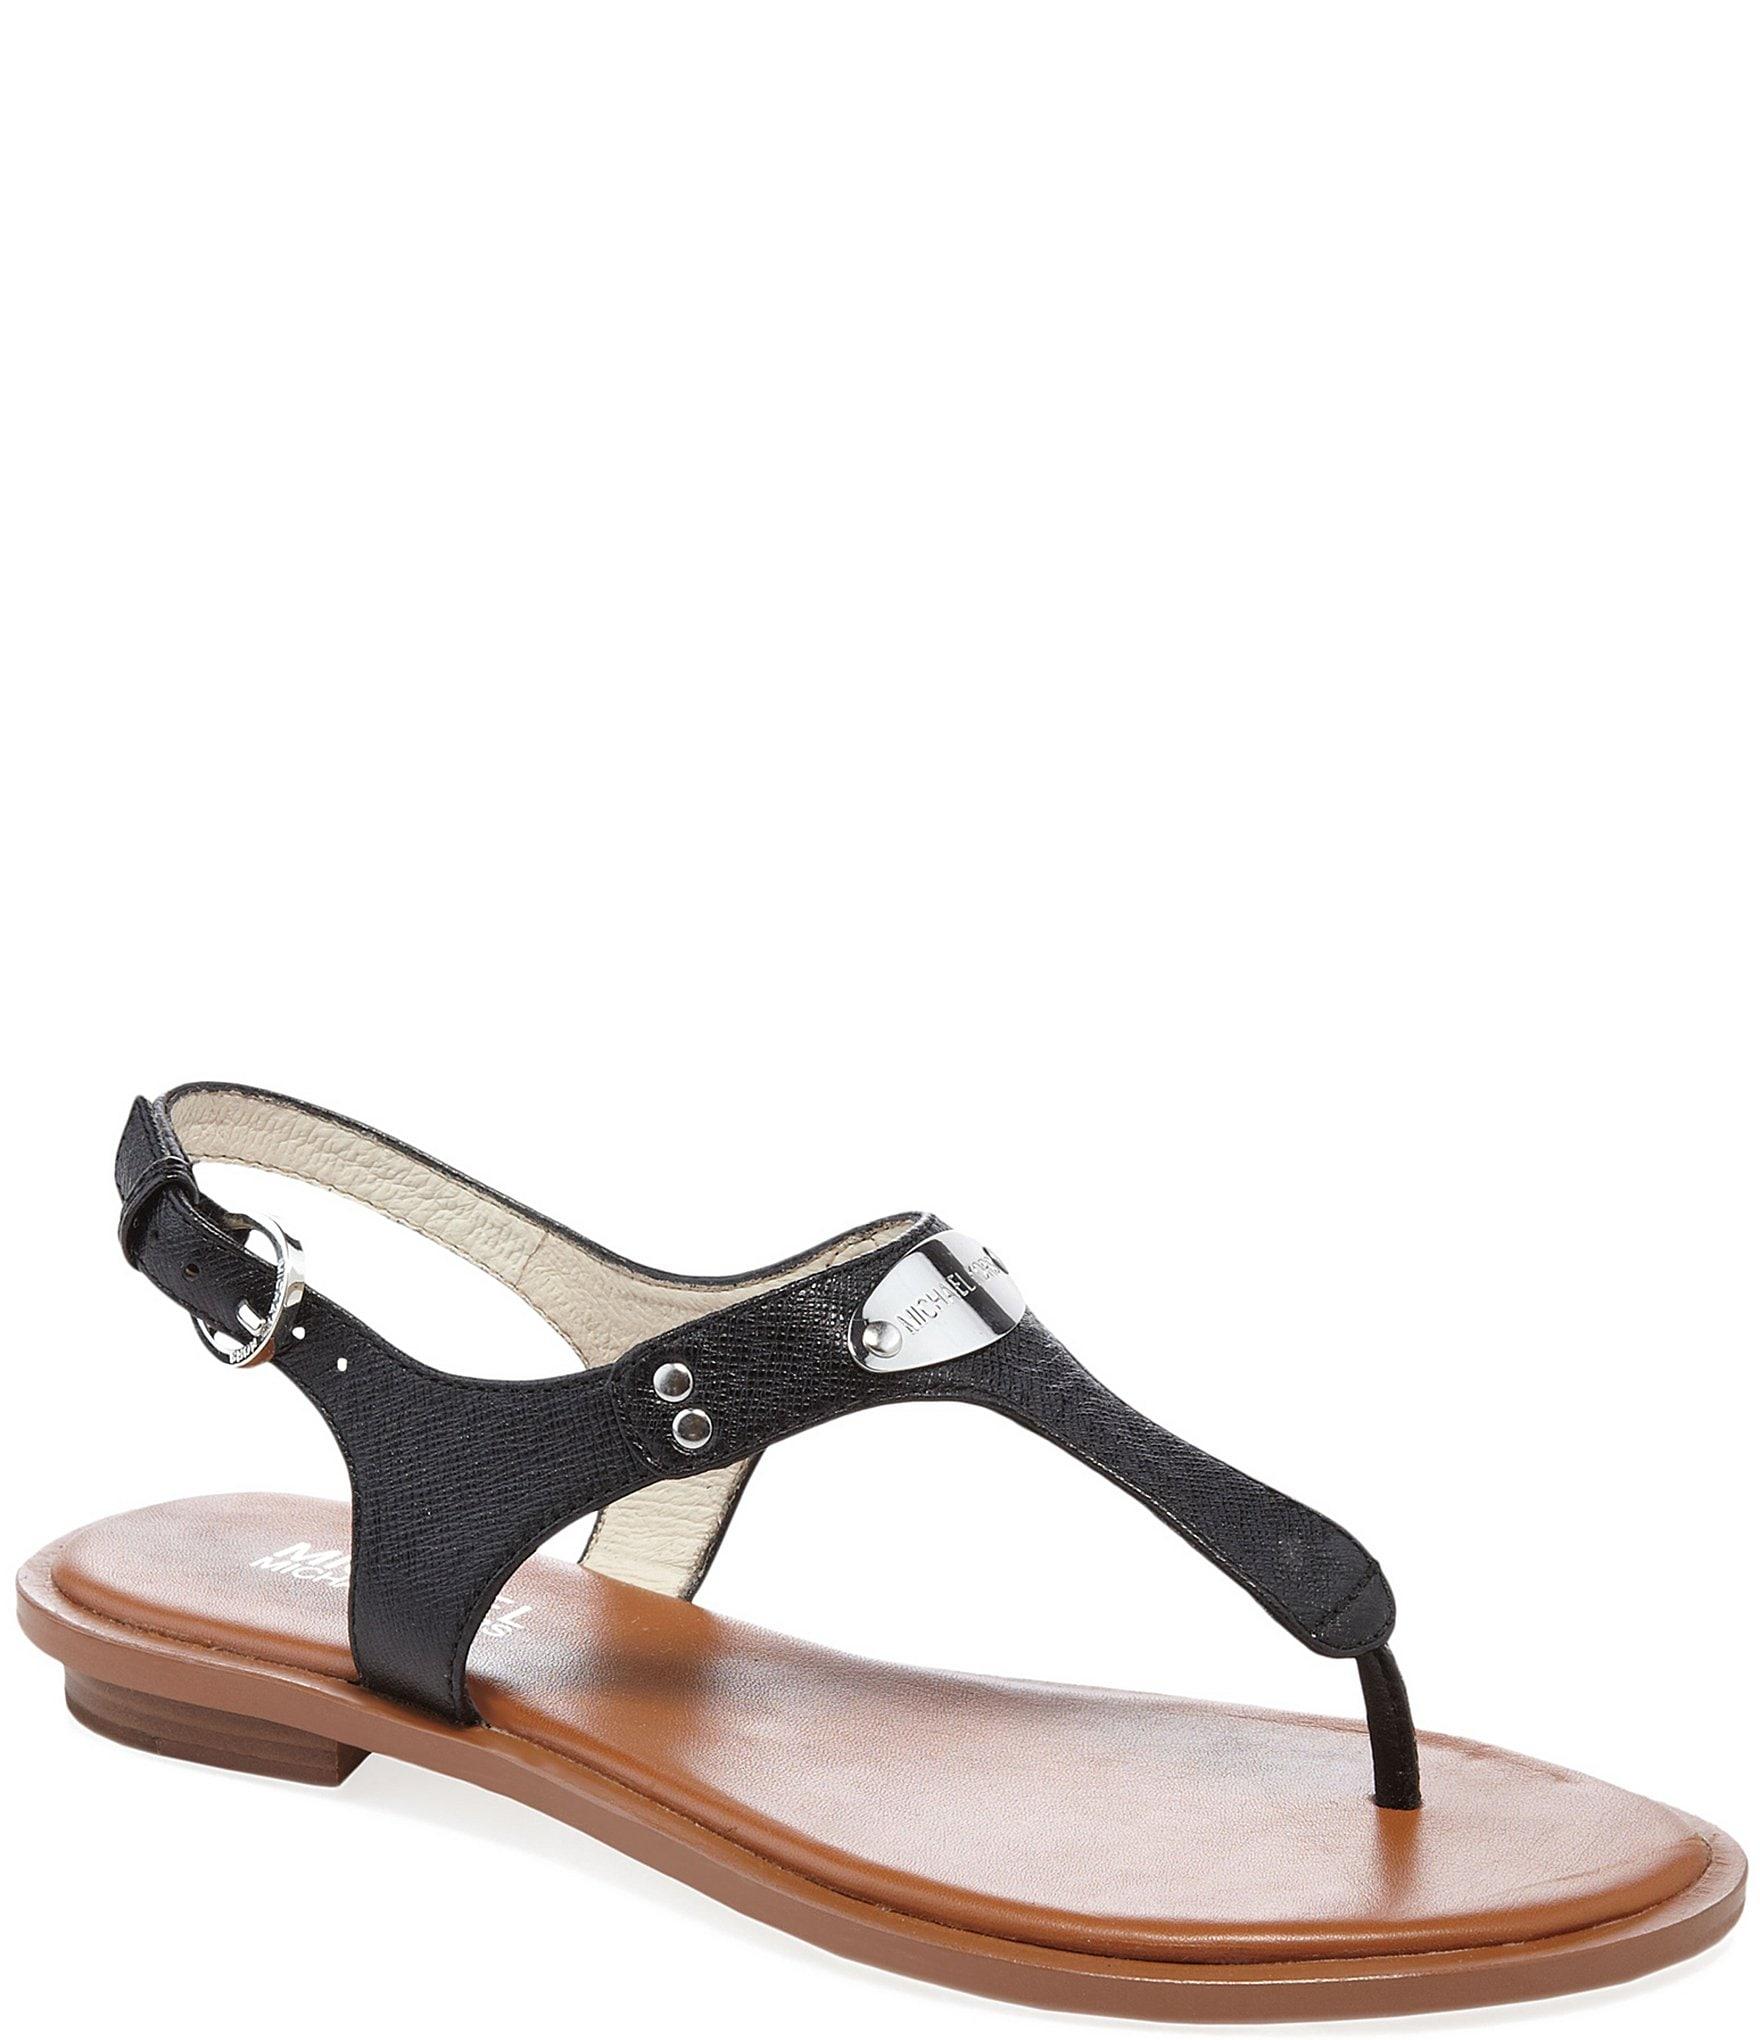 Antonio Melani Bieah Patent Leather Jewel Bee Ornament Thong Sandals S7DlTxWrc